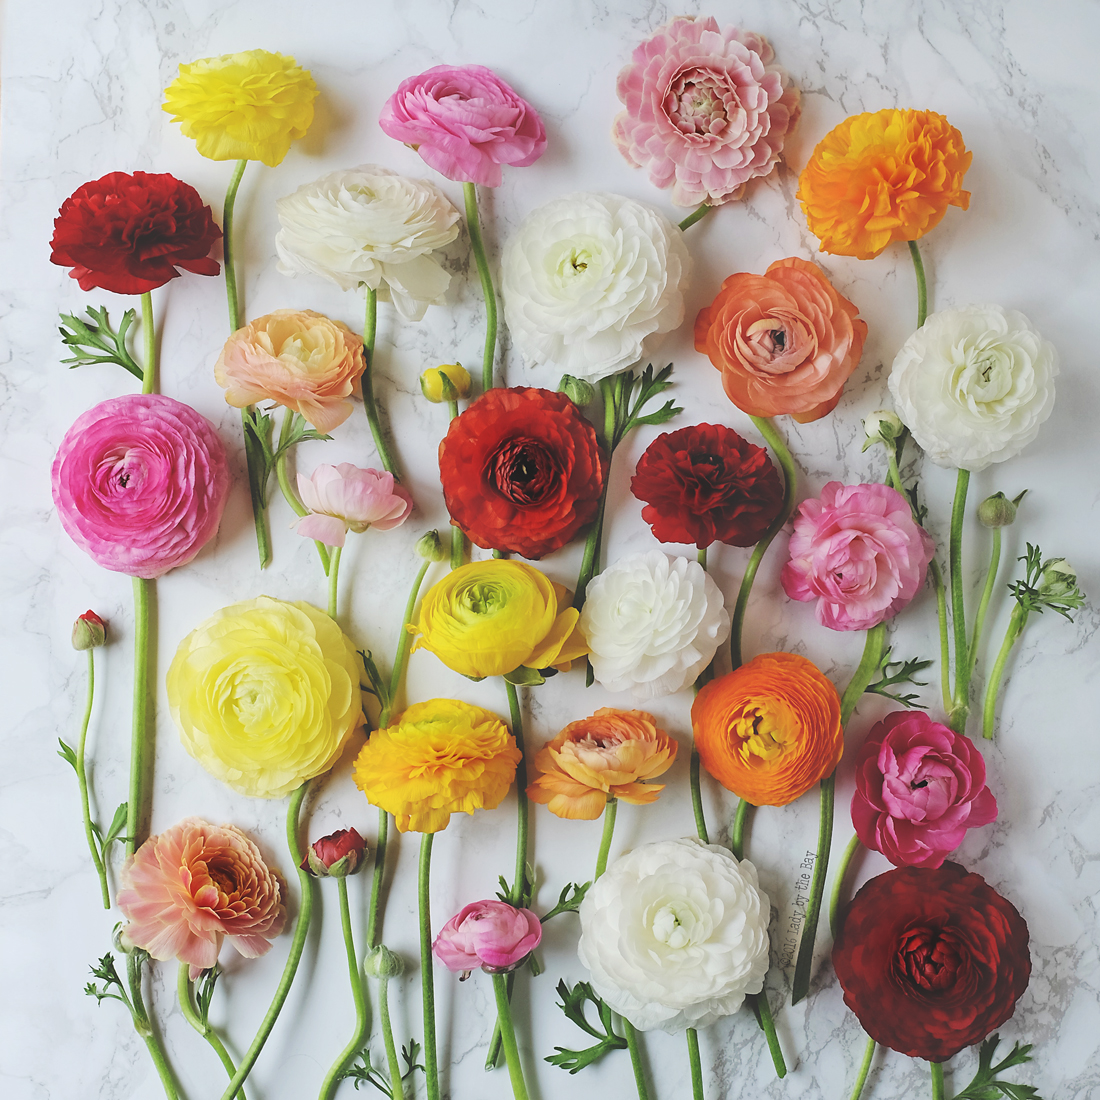 Ladybythebay-Ranunculus Love